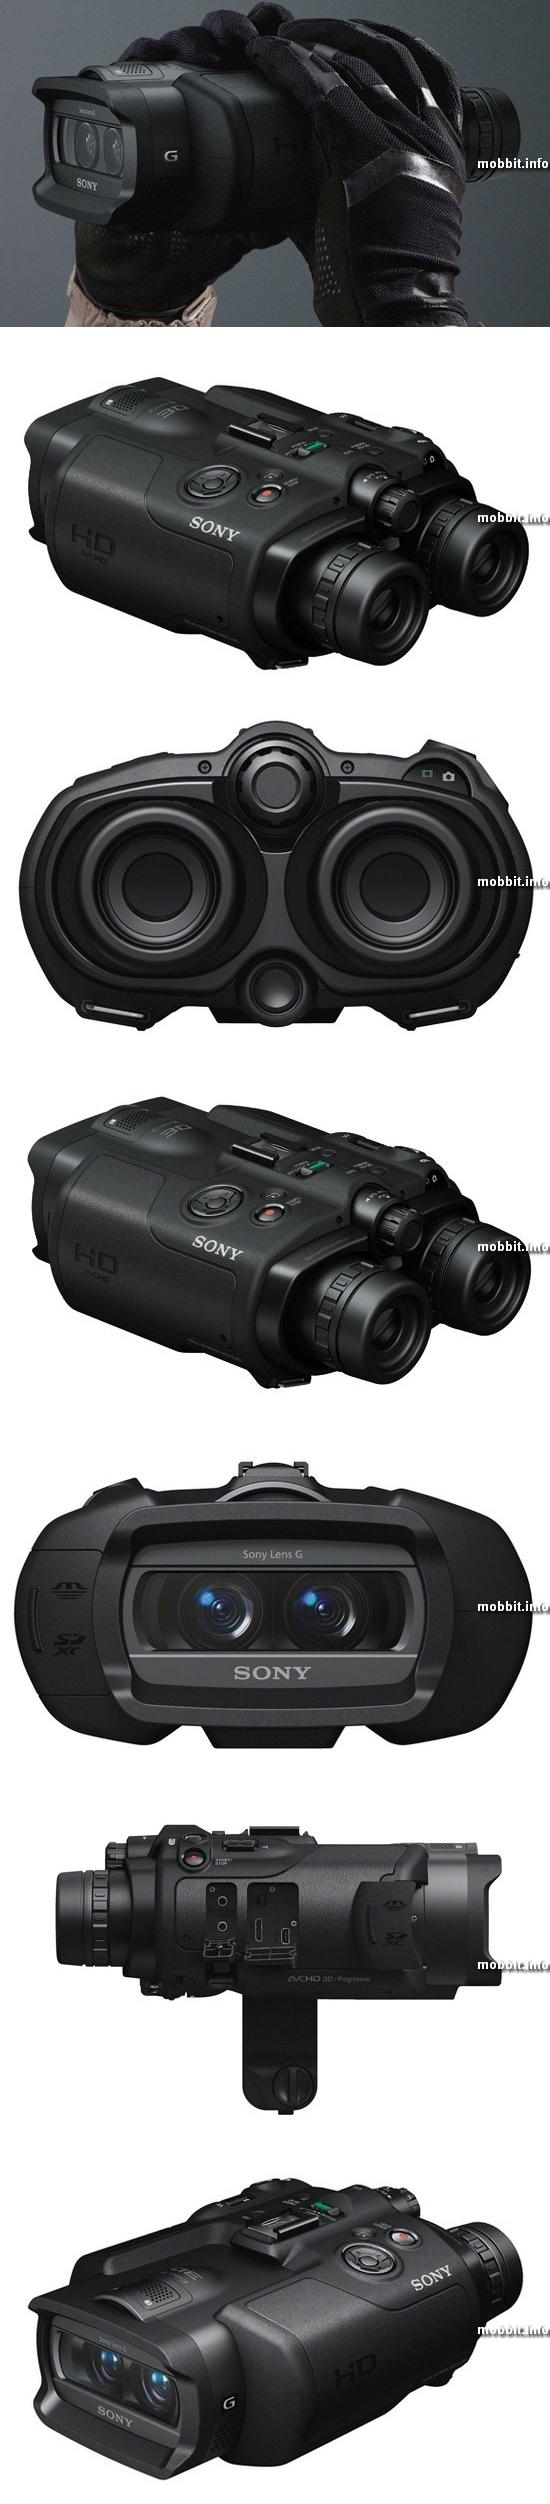 Sony DEV-3 и DEV-5